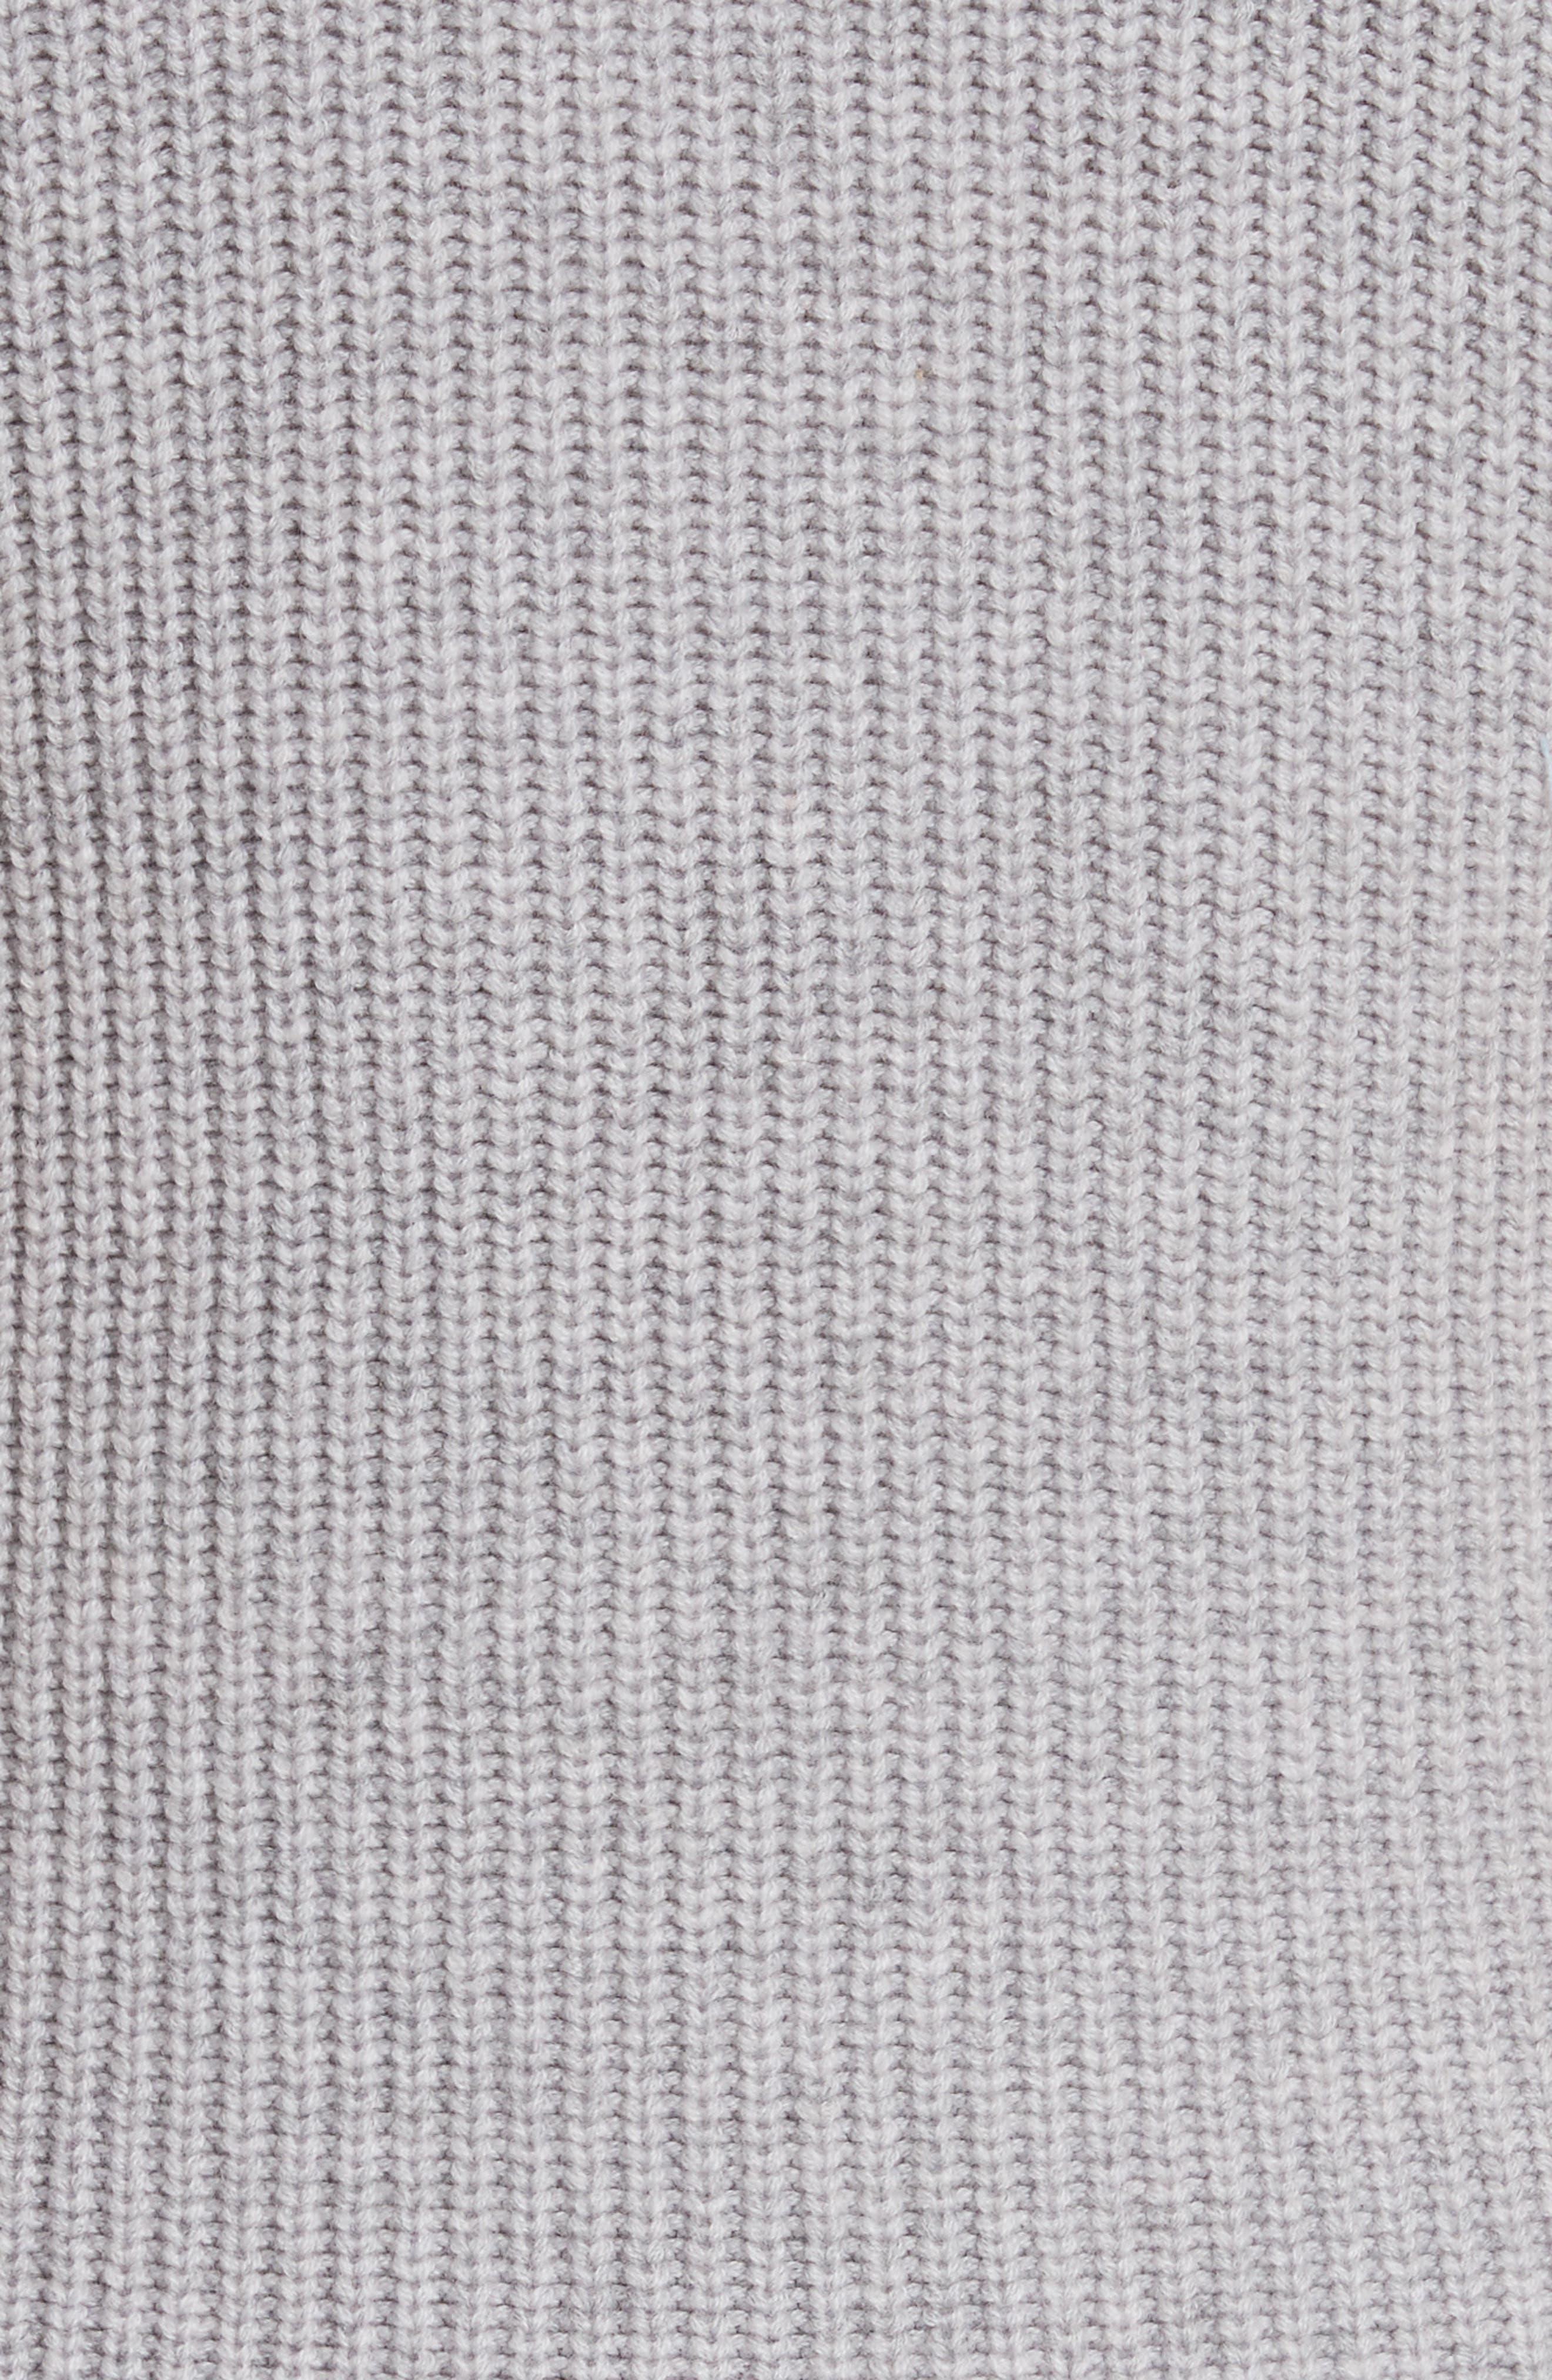 Alternate Image 5  - 3.1 Phillip Lim Twist Knit Dress